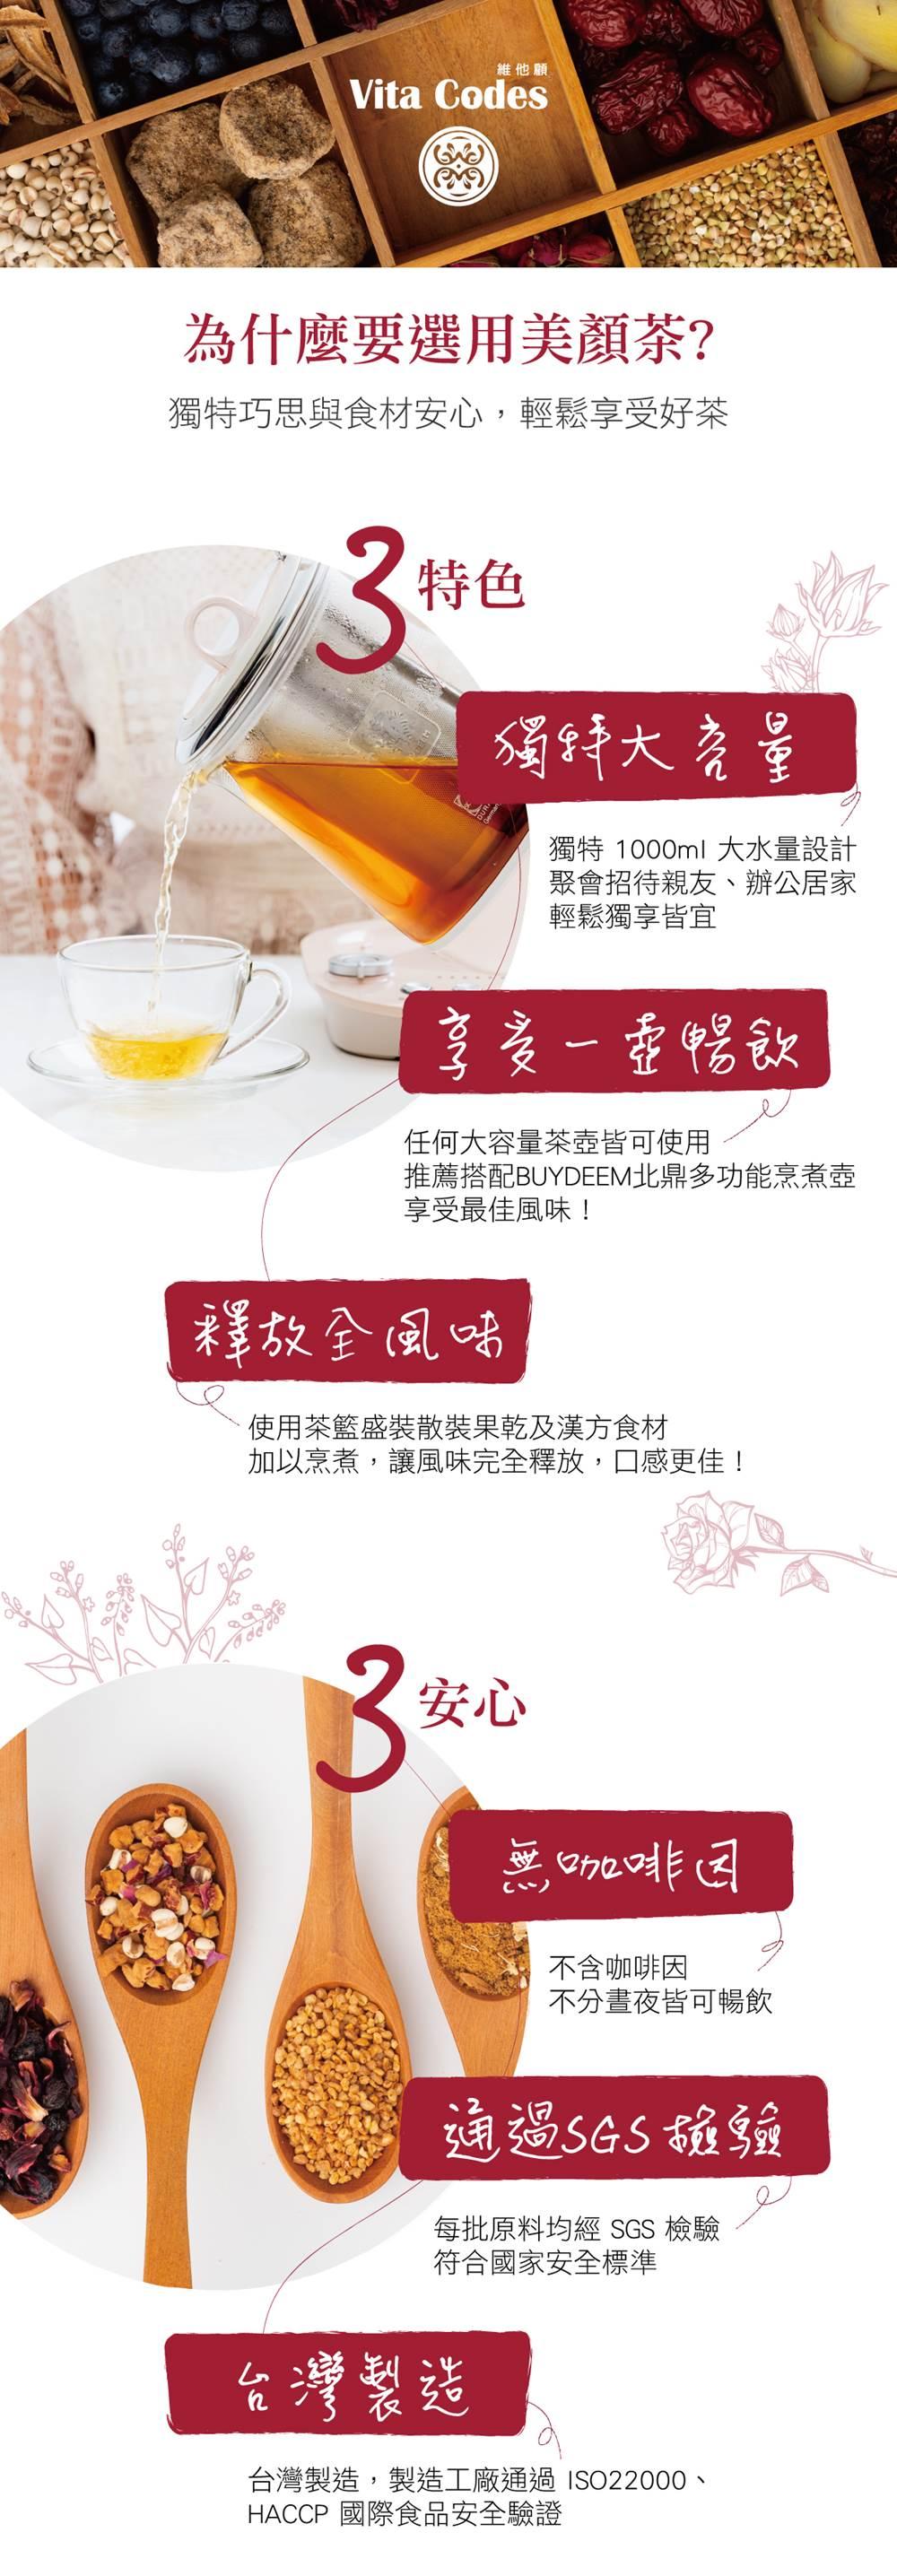 VitaCodes美顏茶-產品介紹03-巧思與安心